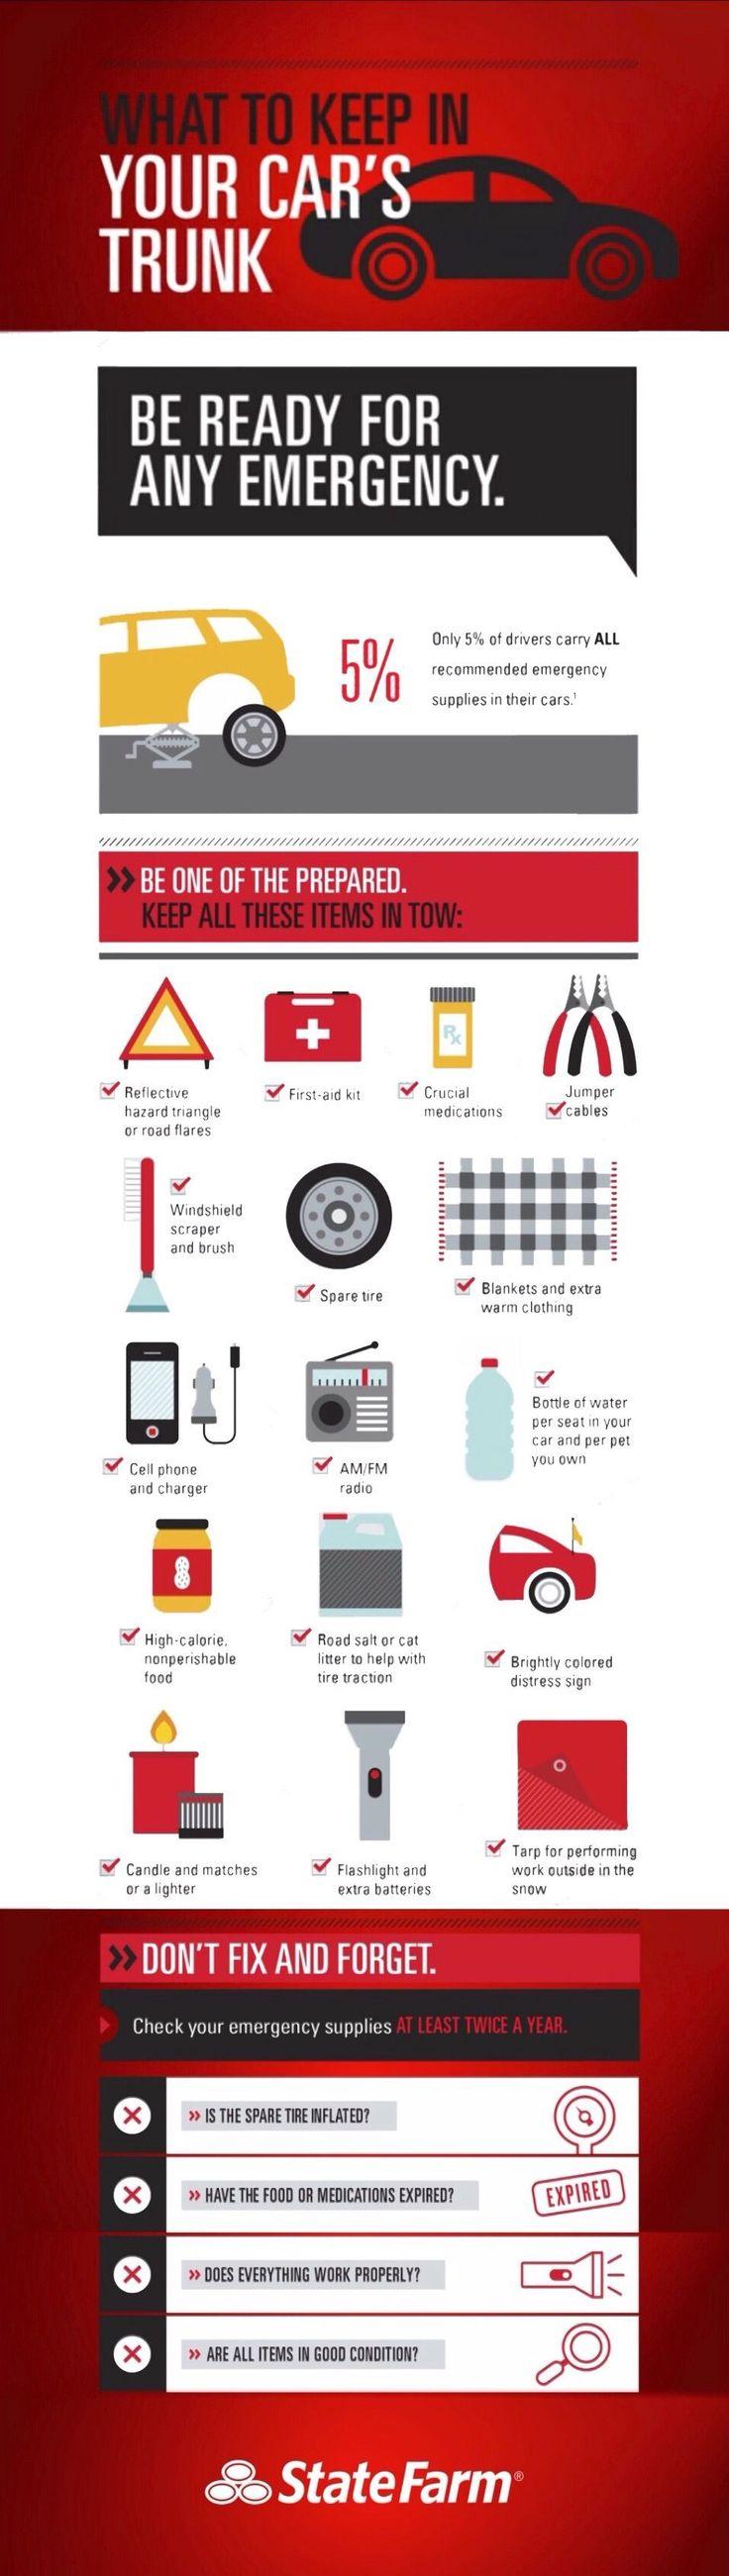 Emergency Preparedness State Farm® Car care tips, Car